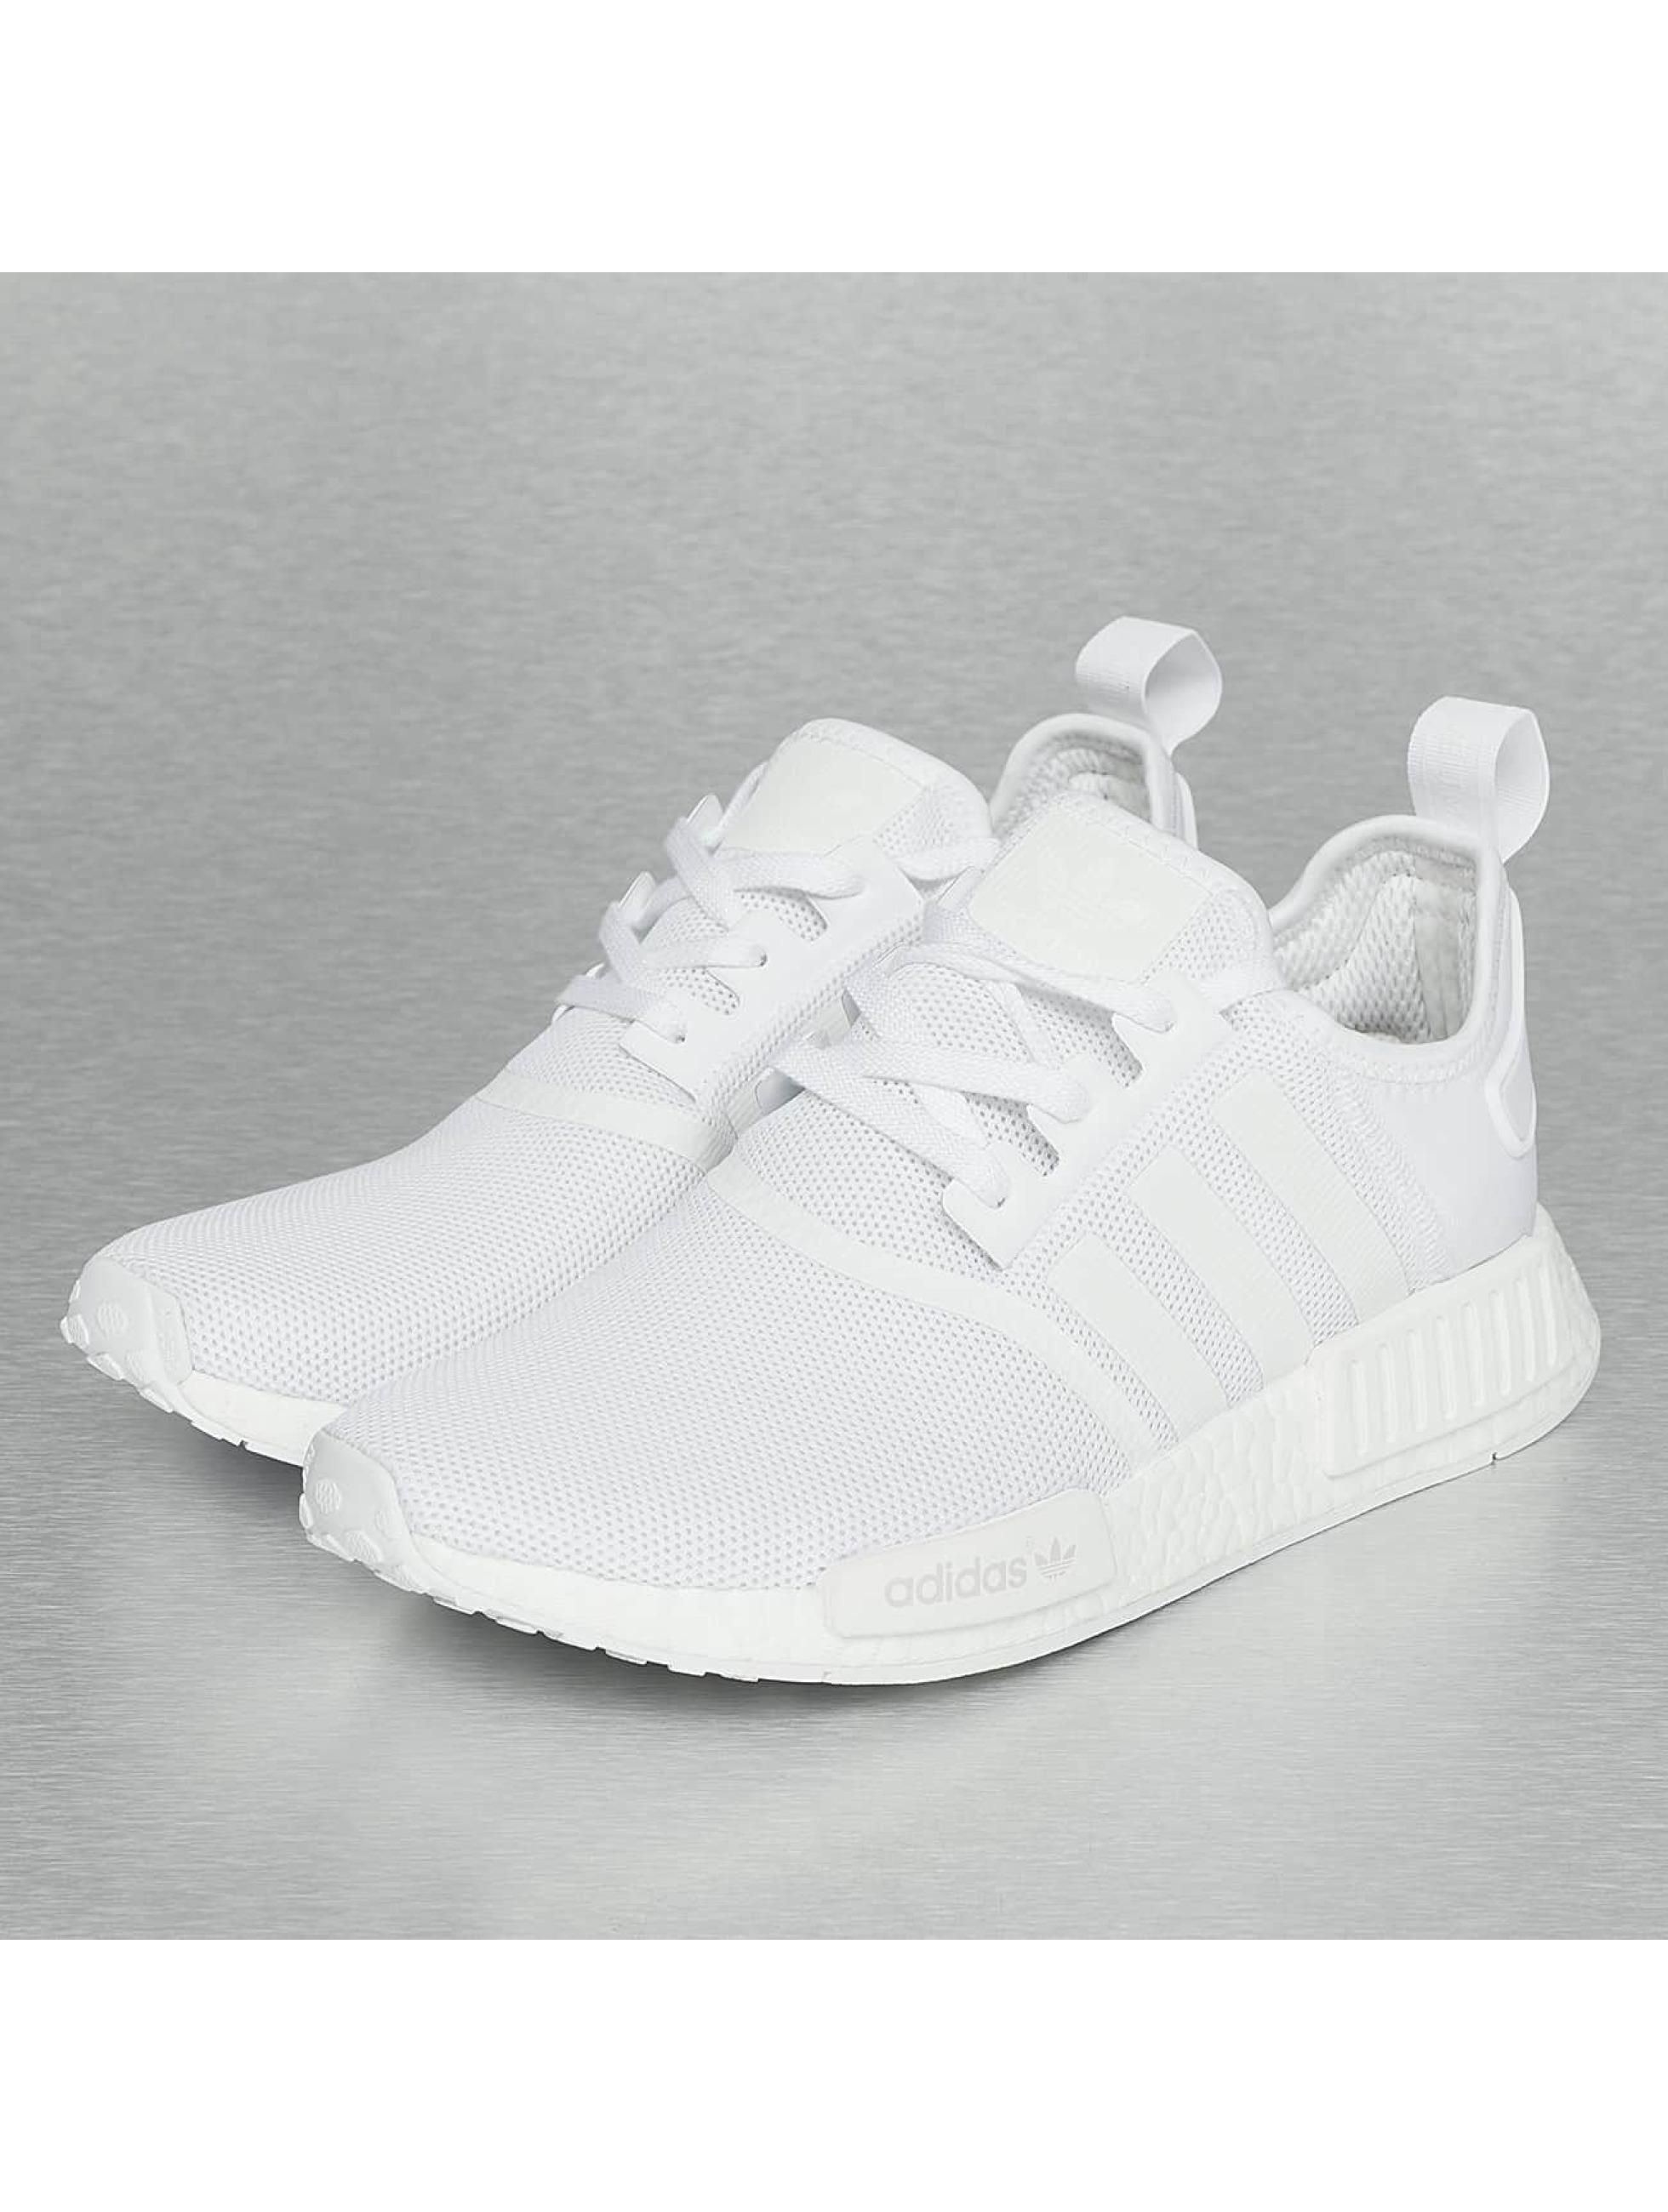 adidas schuhe damen nmd r1 weiß